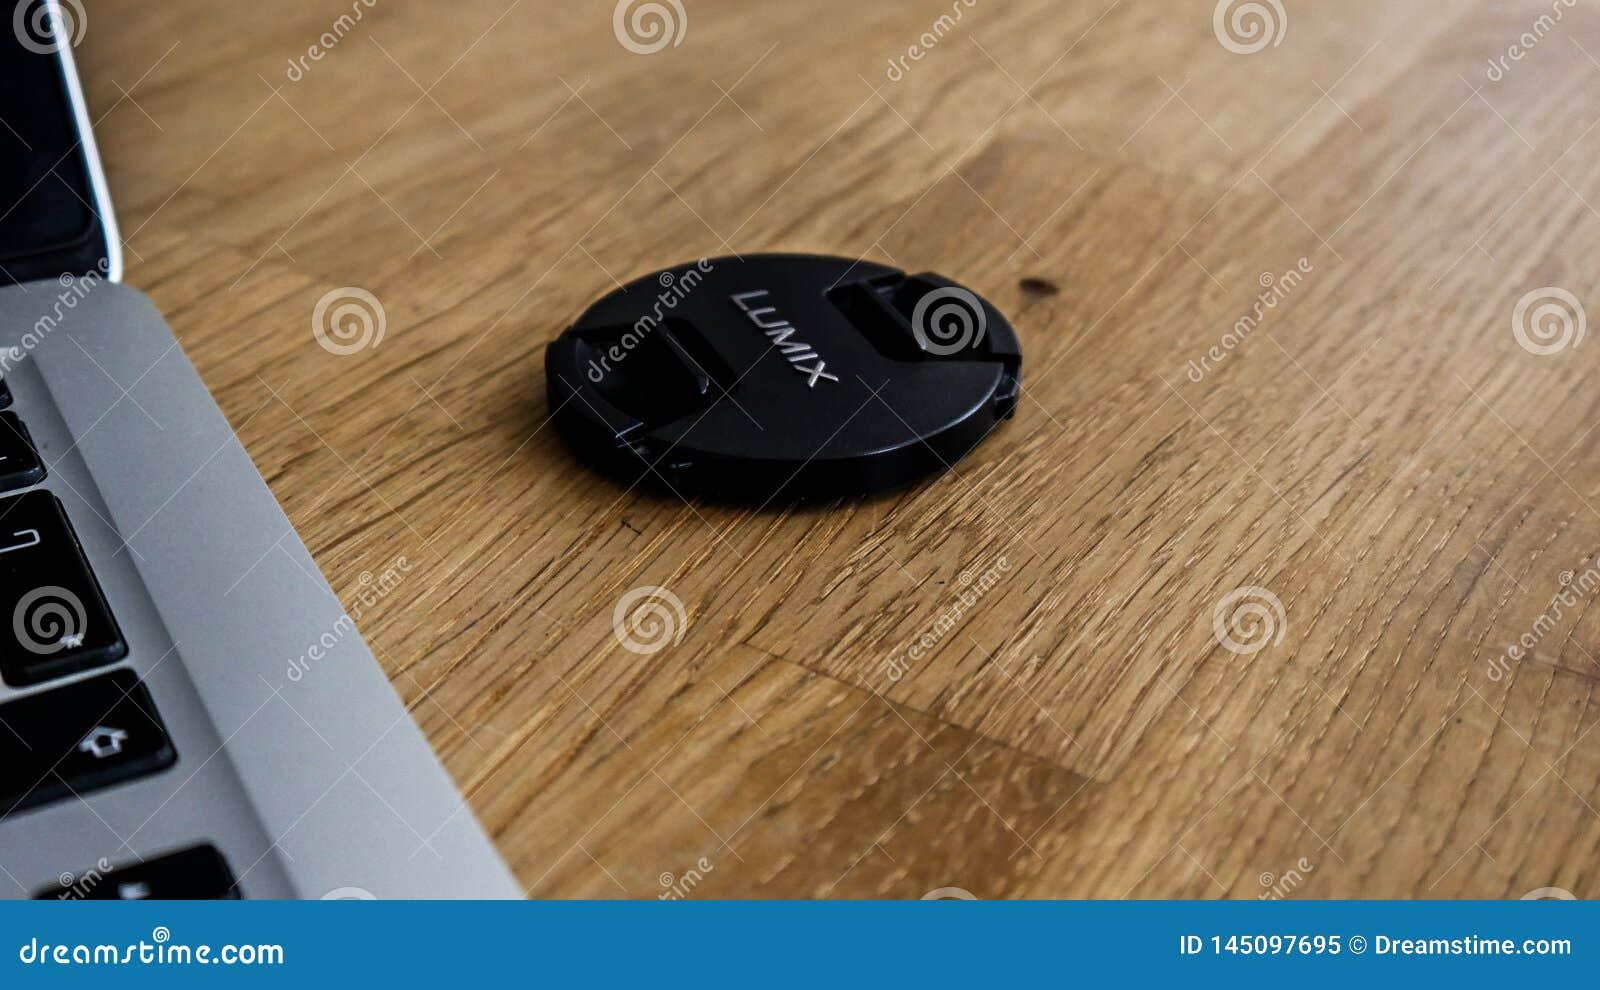 Un casquillo de lente del lumix de panasonic al lado de un macbook